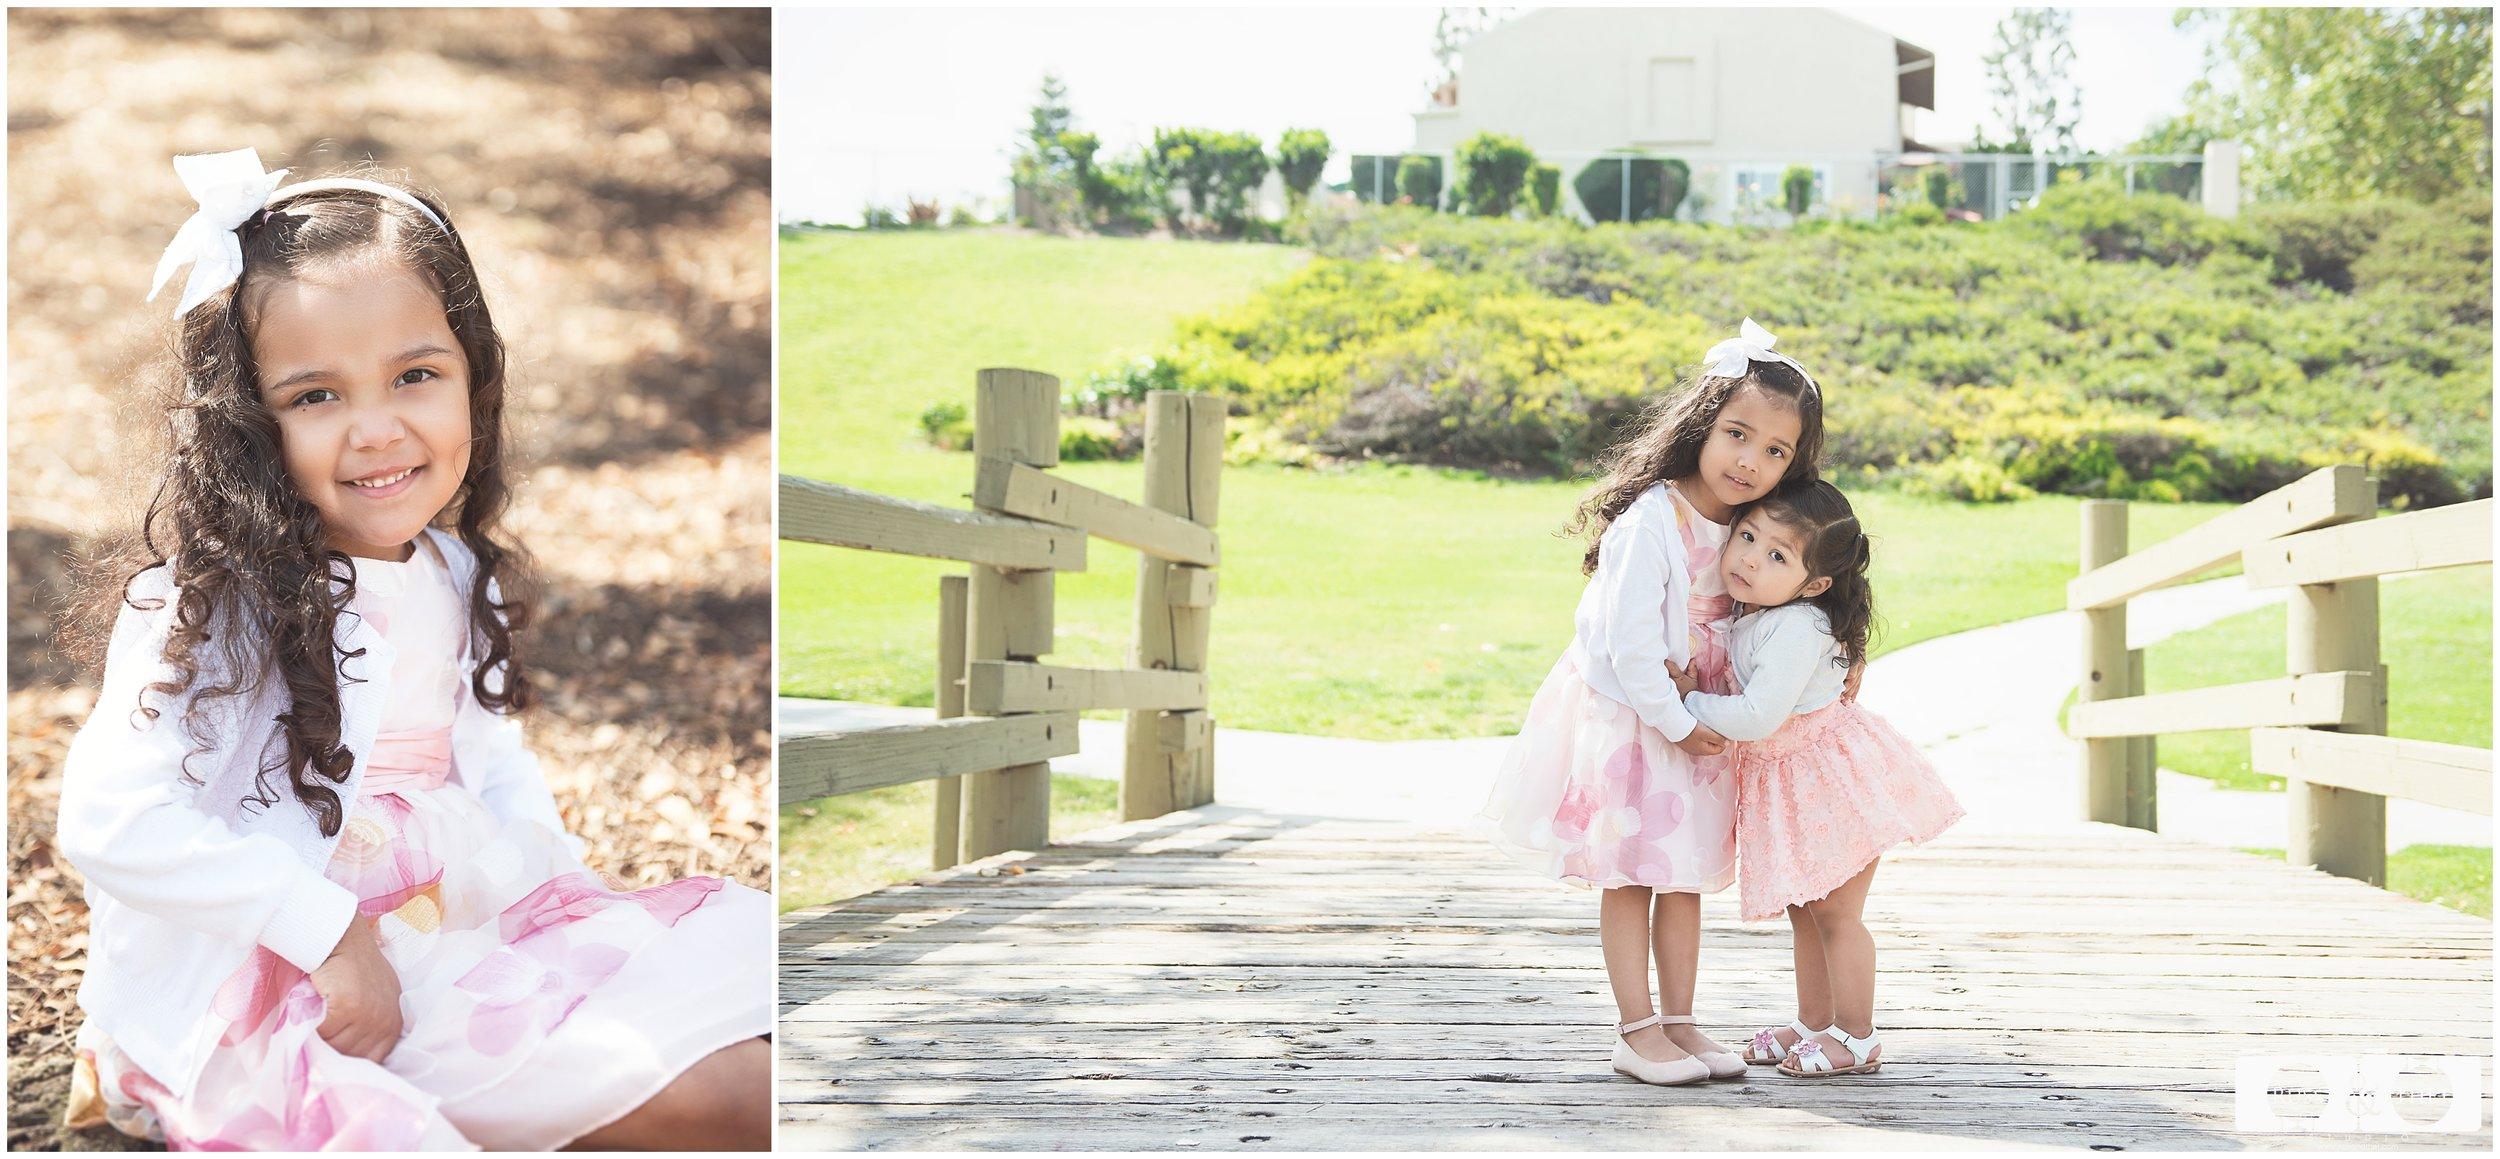 La-Mirada-Creek-Park-Family-Maternity-Kids-Portraits (11).jpg